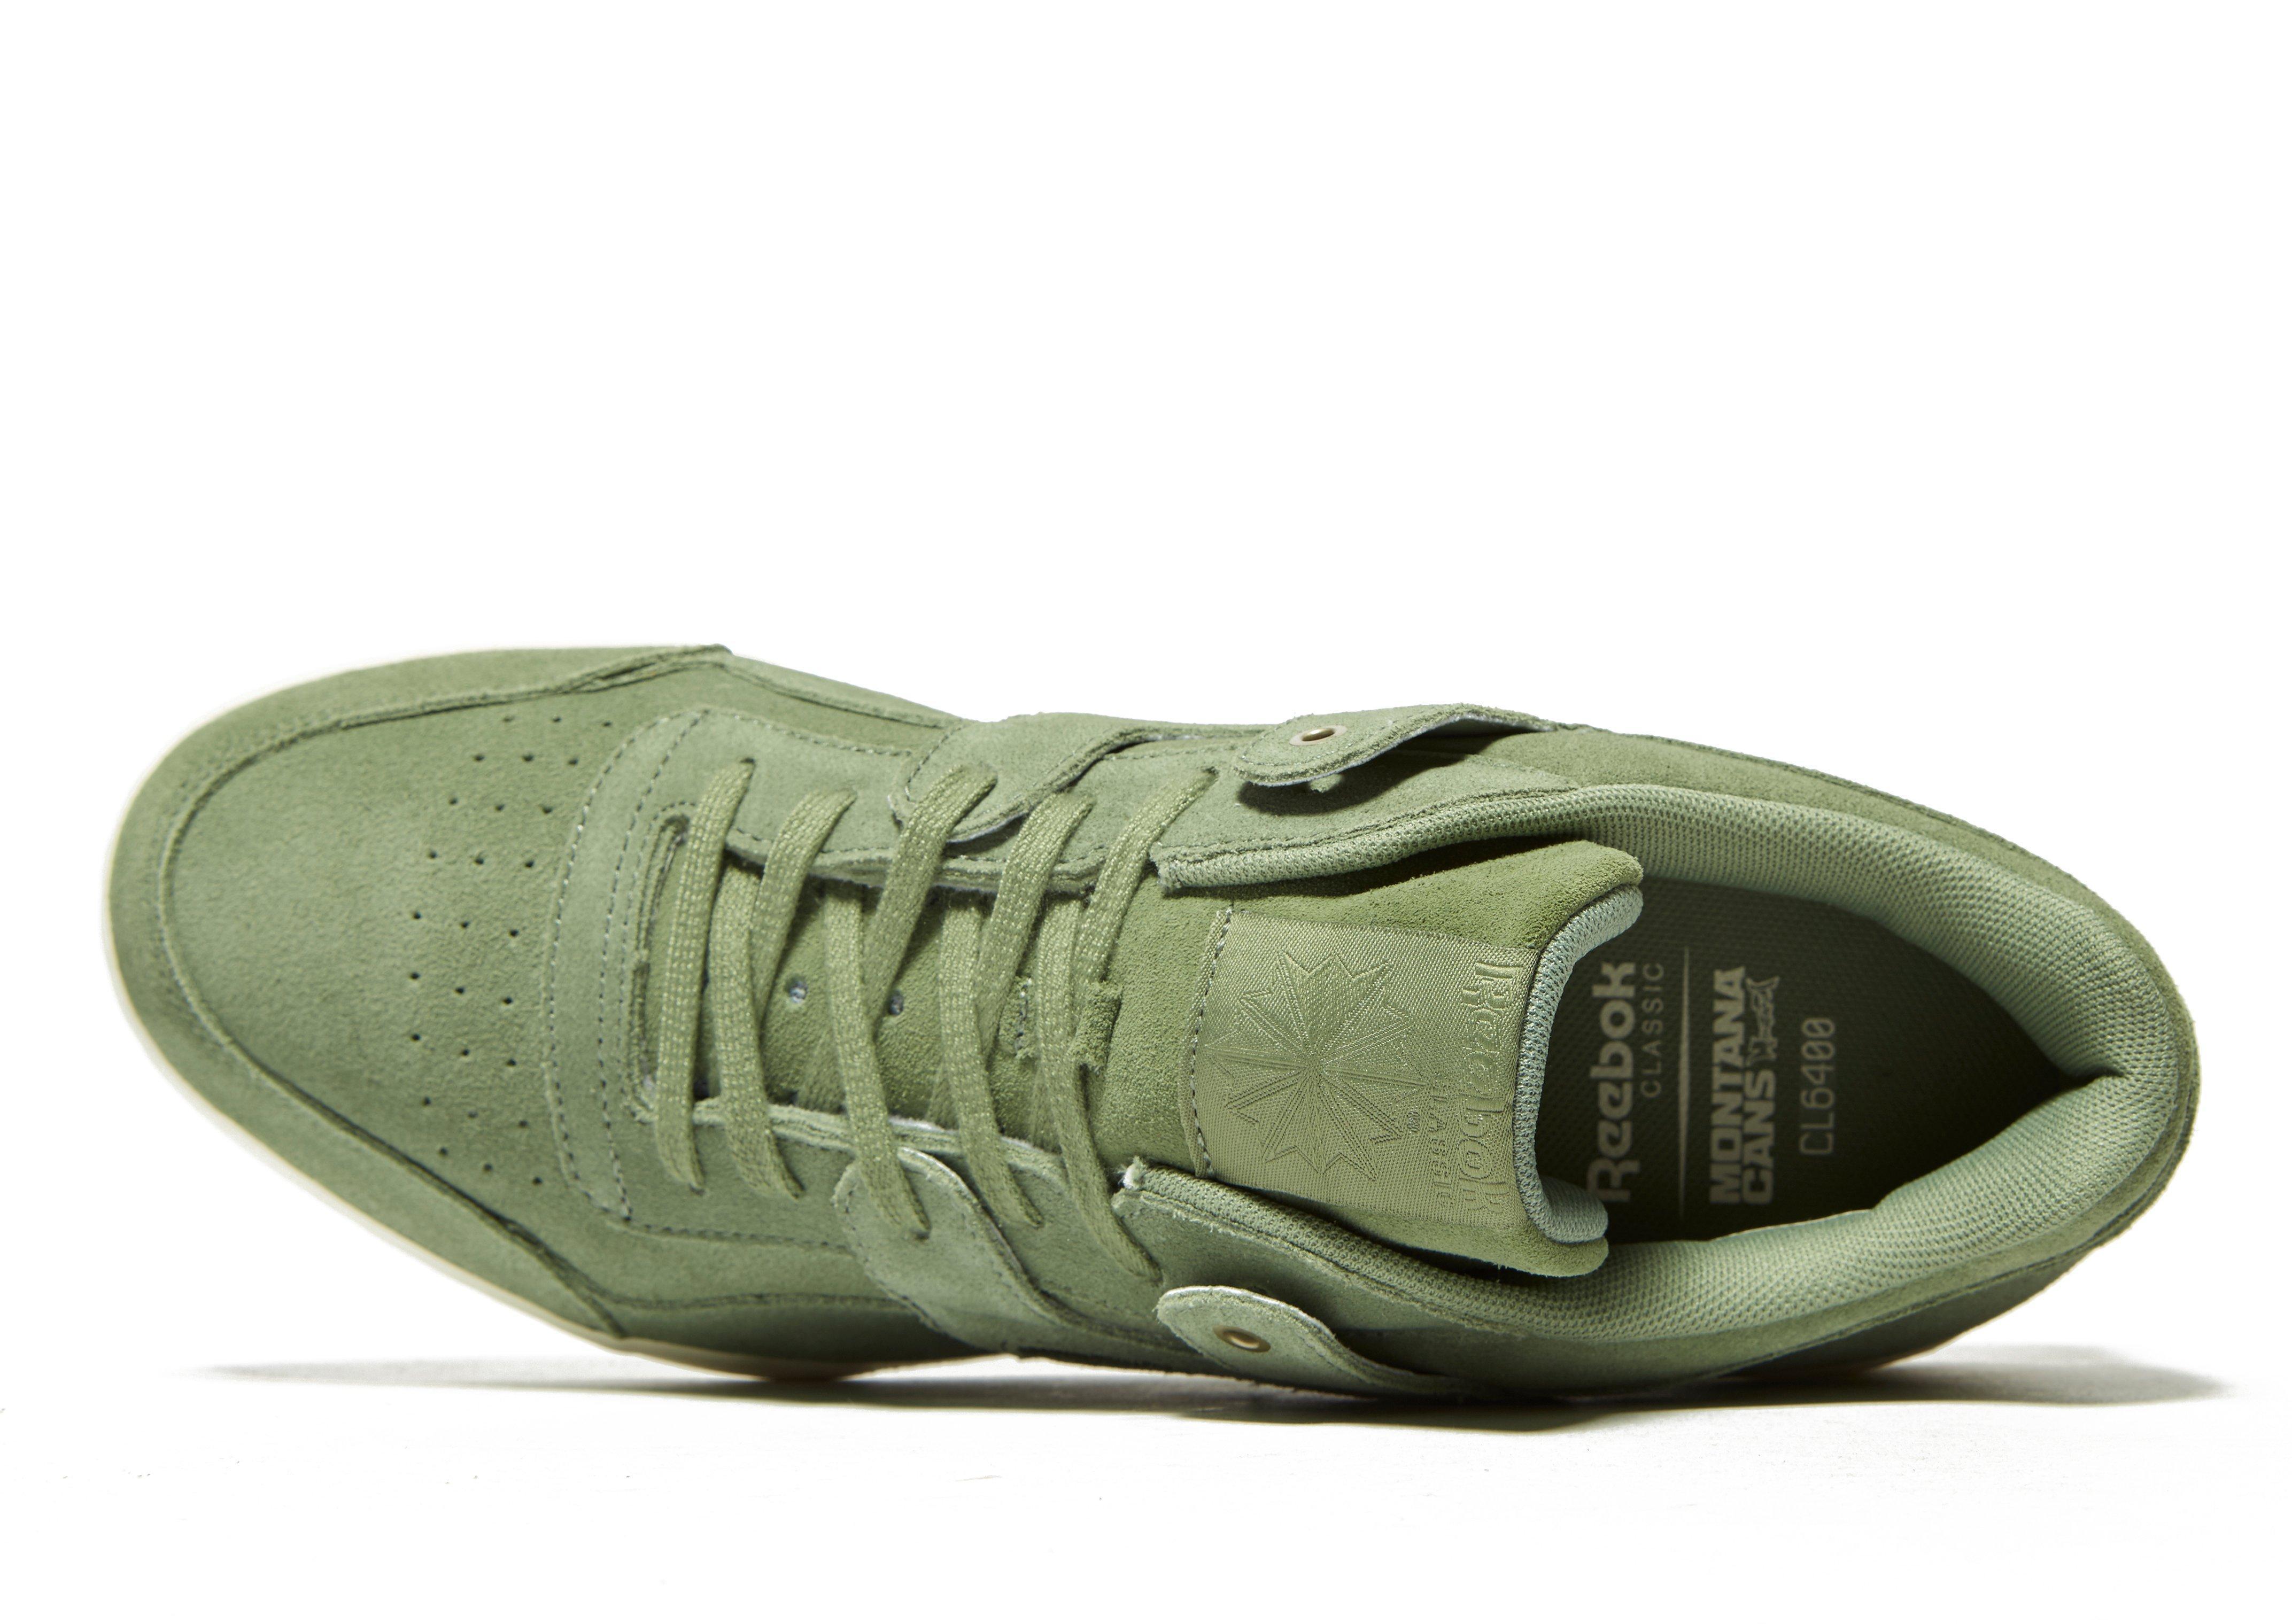 24b7232f15a Lyst - Reebok Workout Plus Mcc in Green for Men